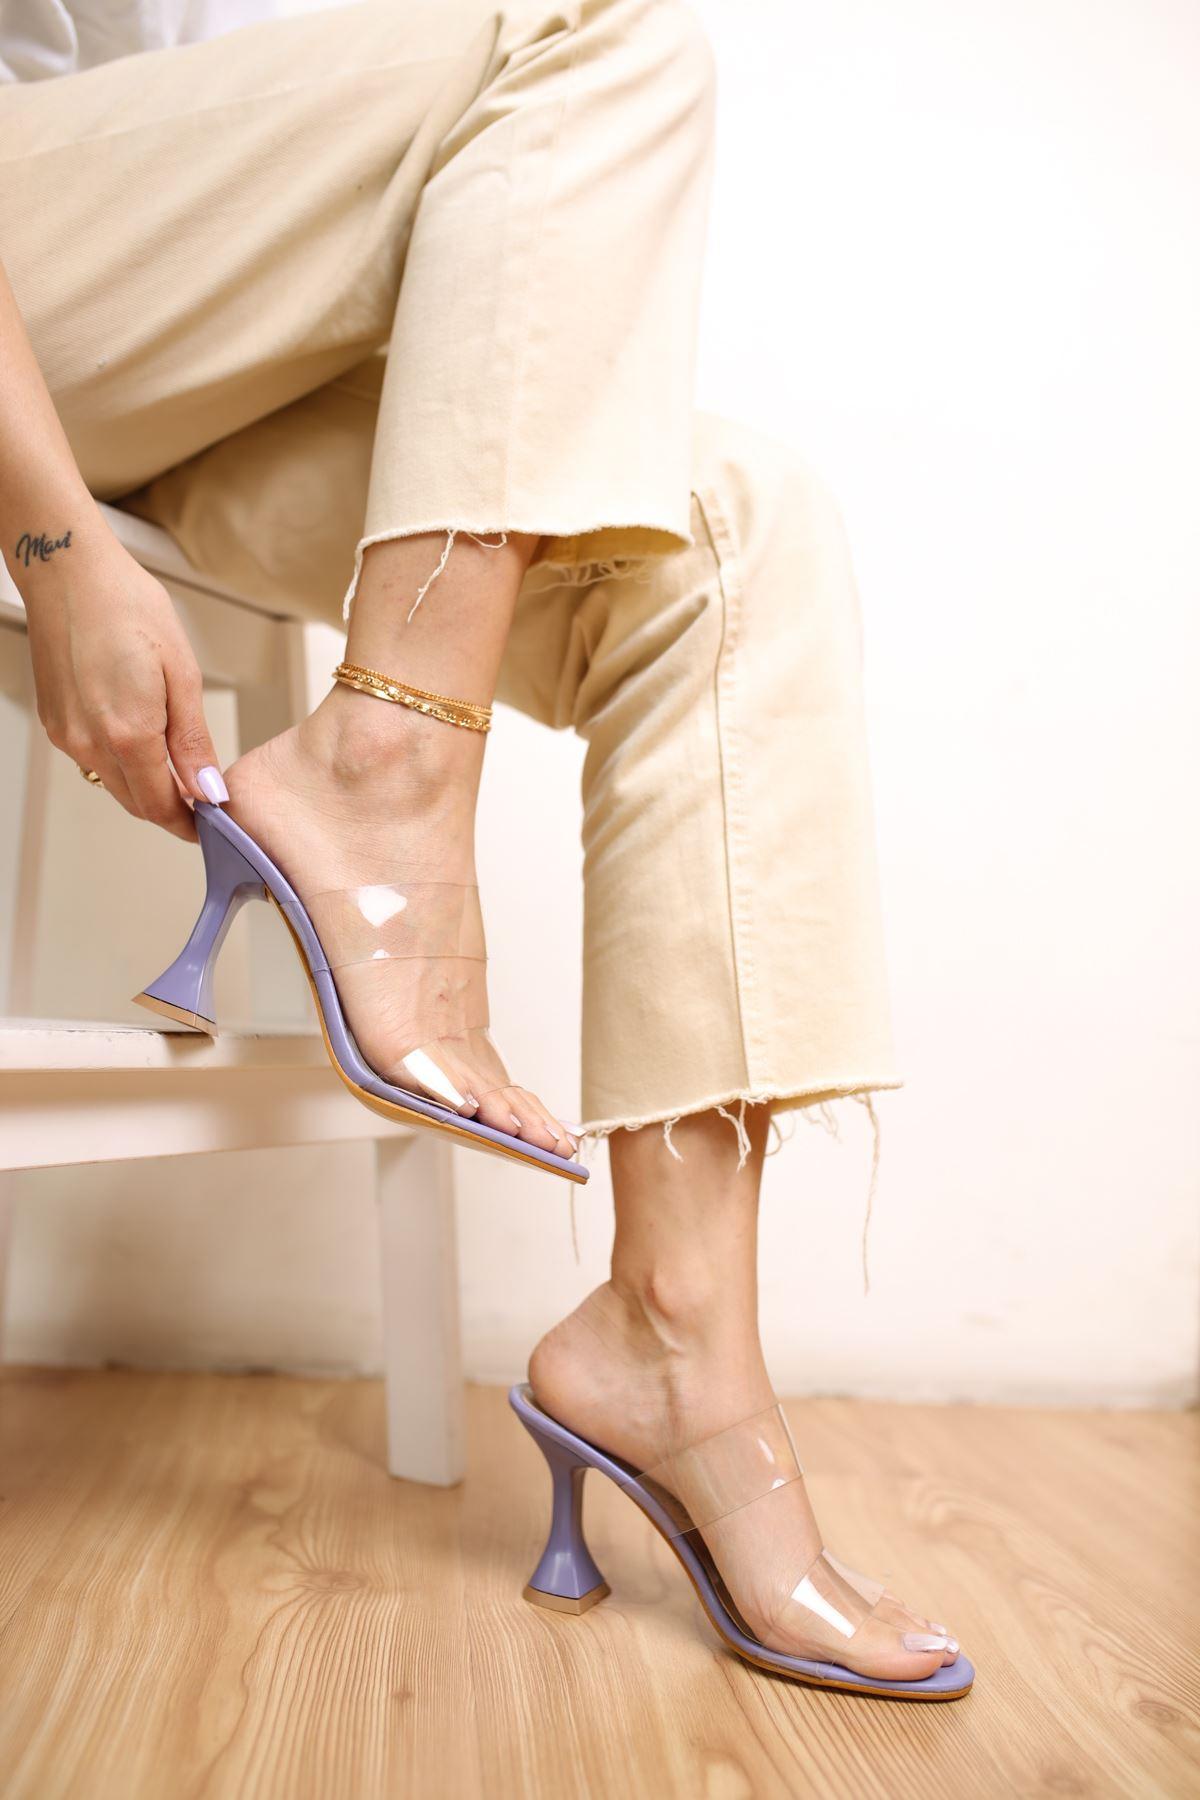 Faus Lila Mat Deri Şeffaf Kadın Topuklu Ayakkabı